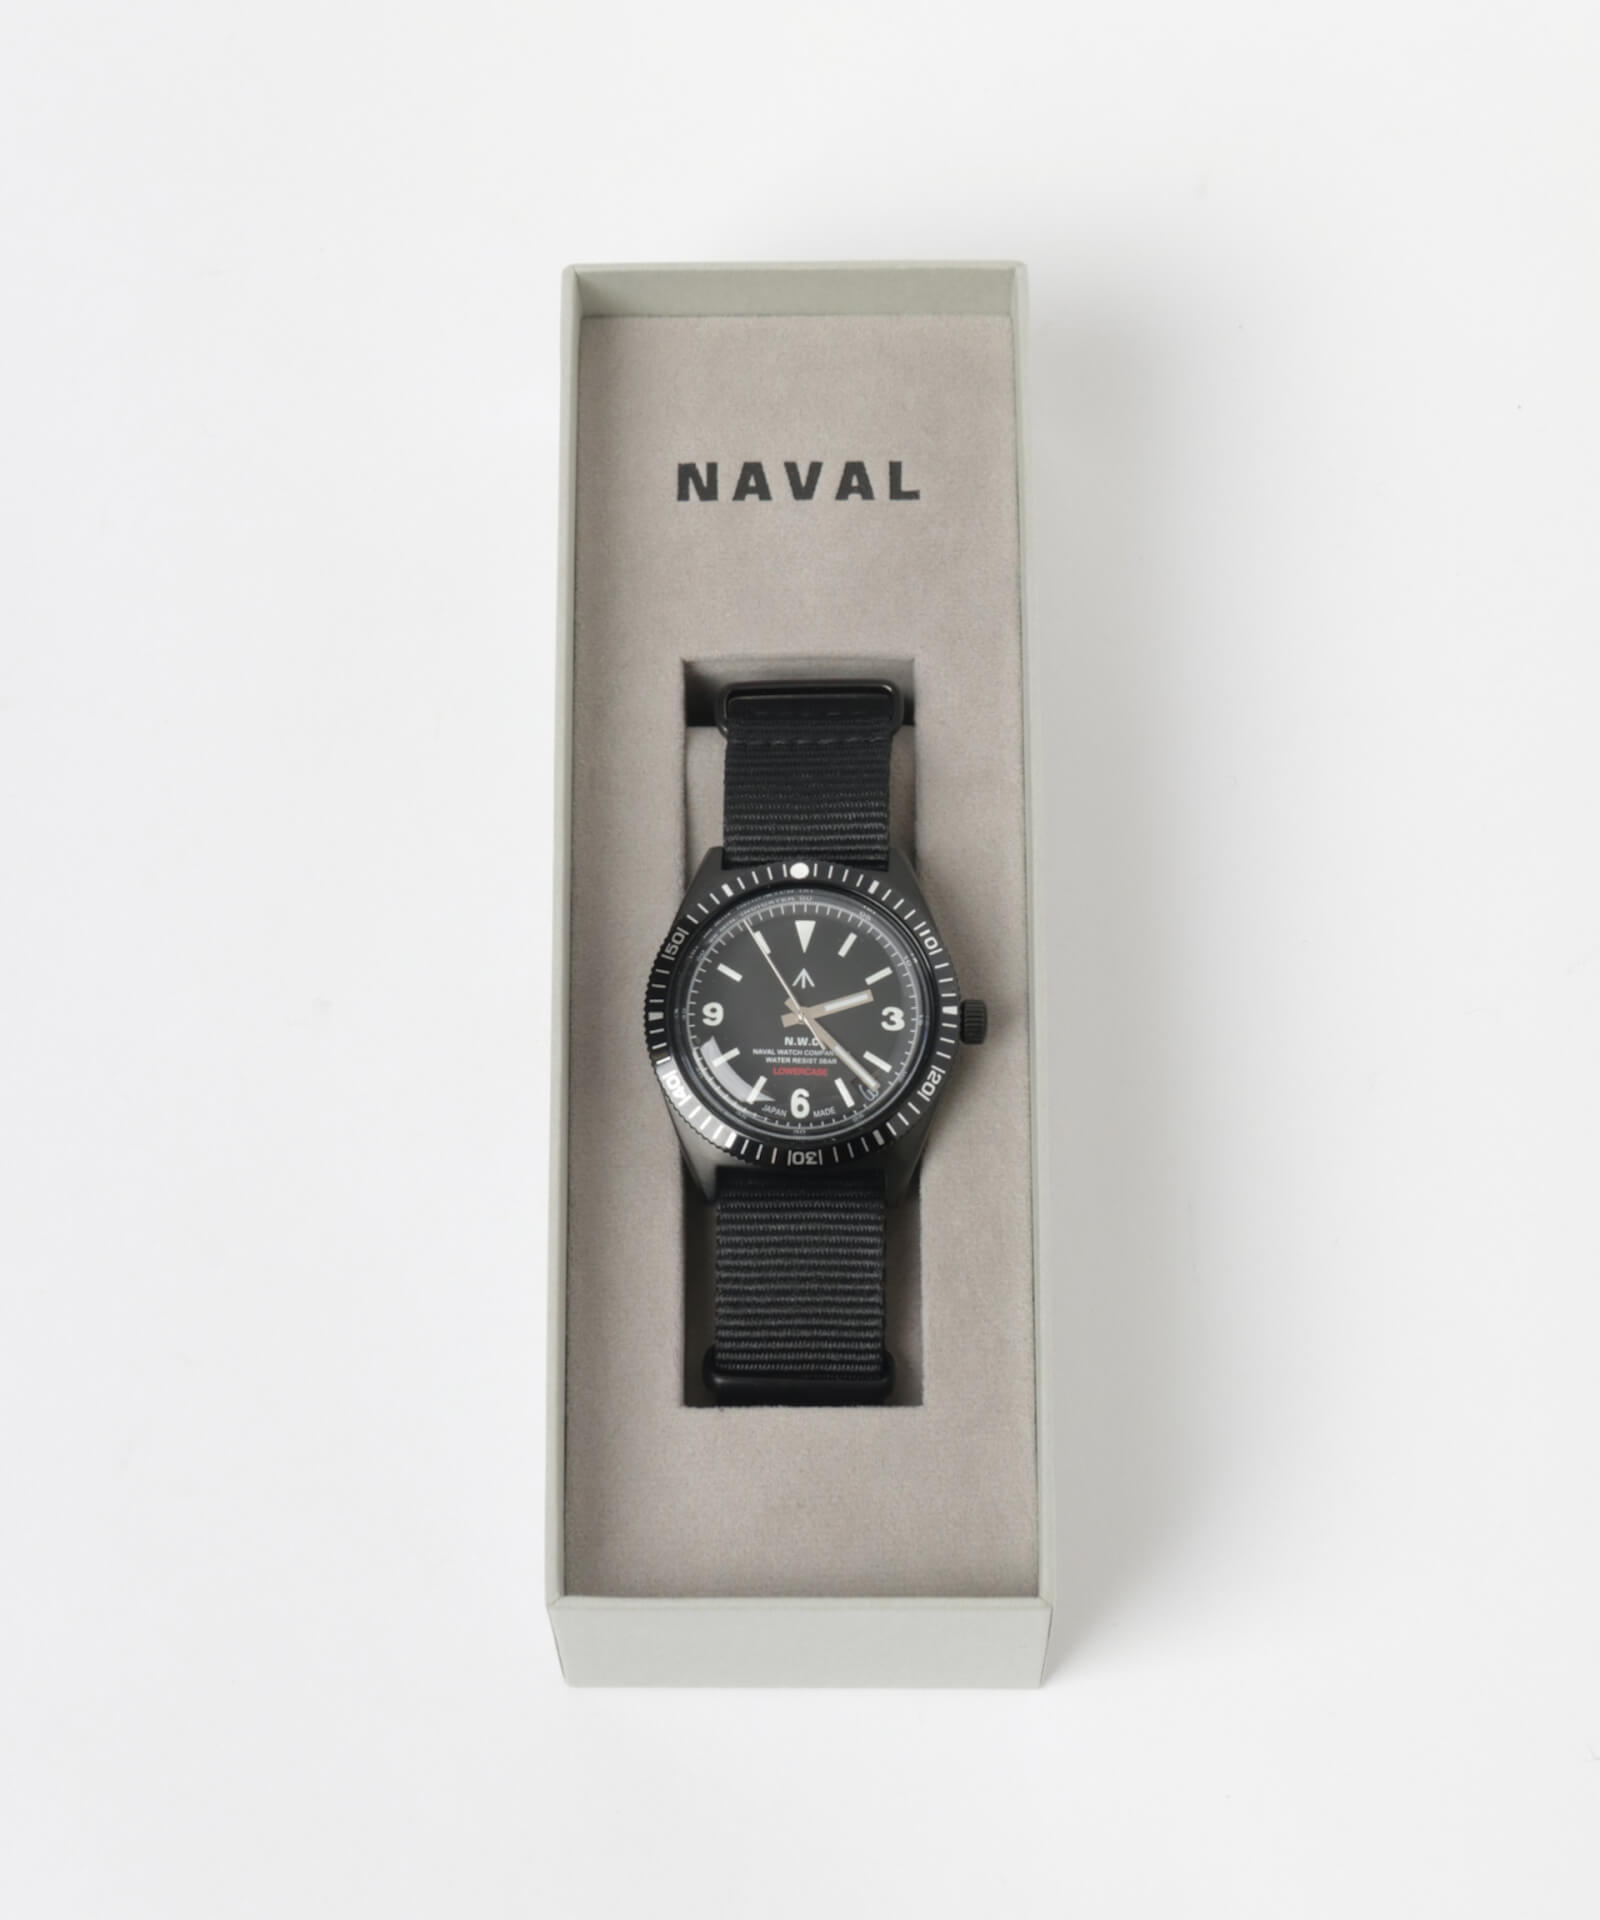 NAVAL WATCHのURBAN RESEARCHエクスクルーシブモデル第2弾が予約販売スタート! life210618_navalwatch_urbanresearch_4